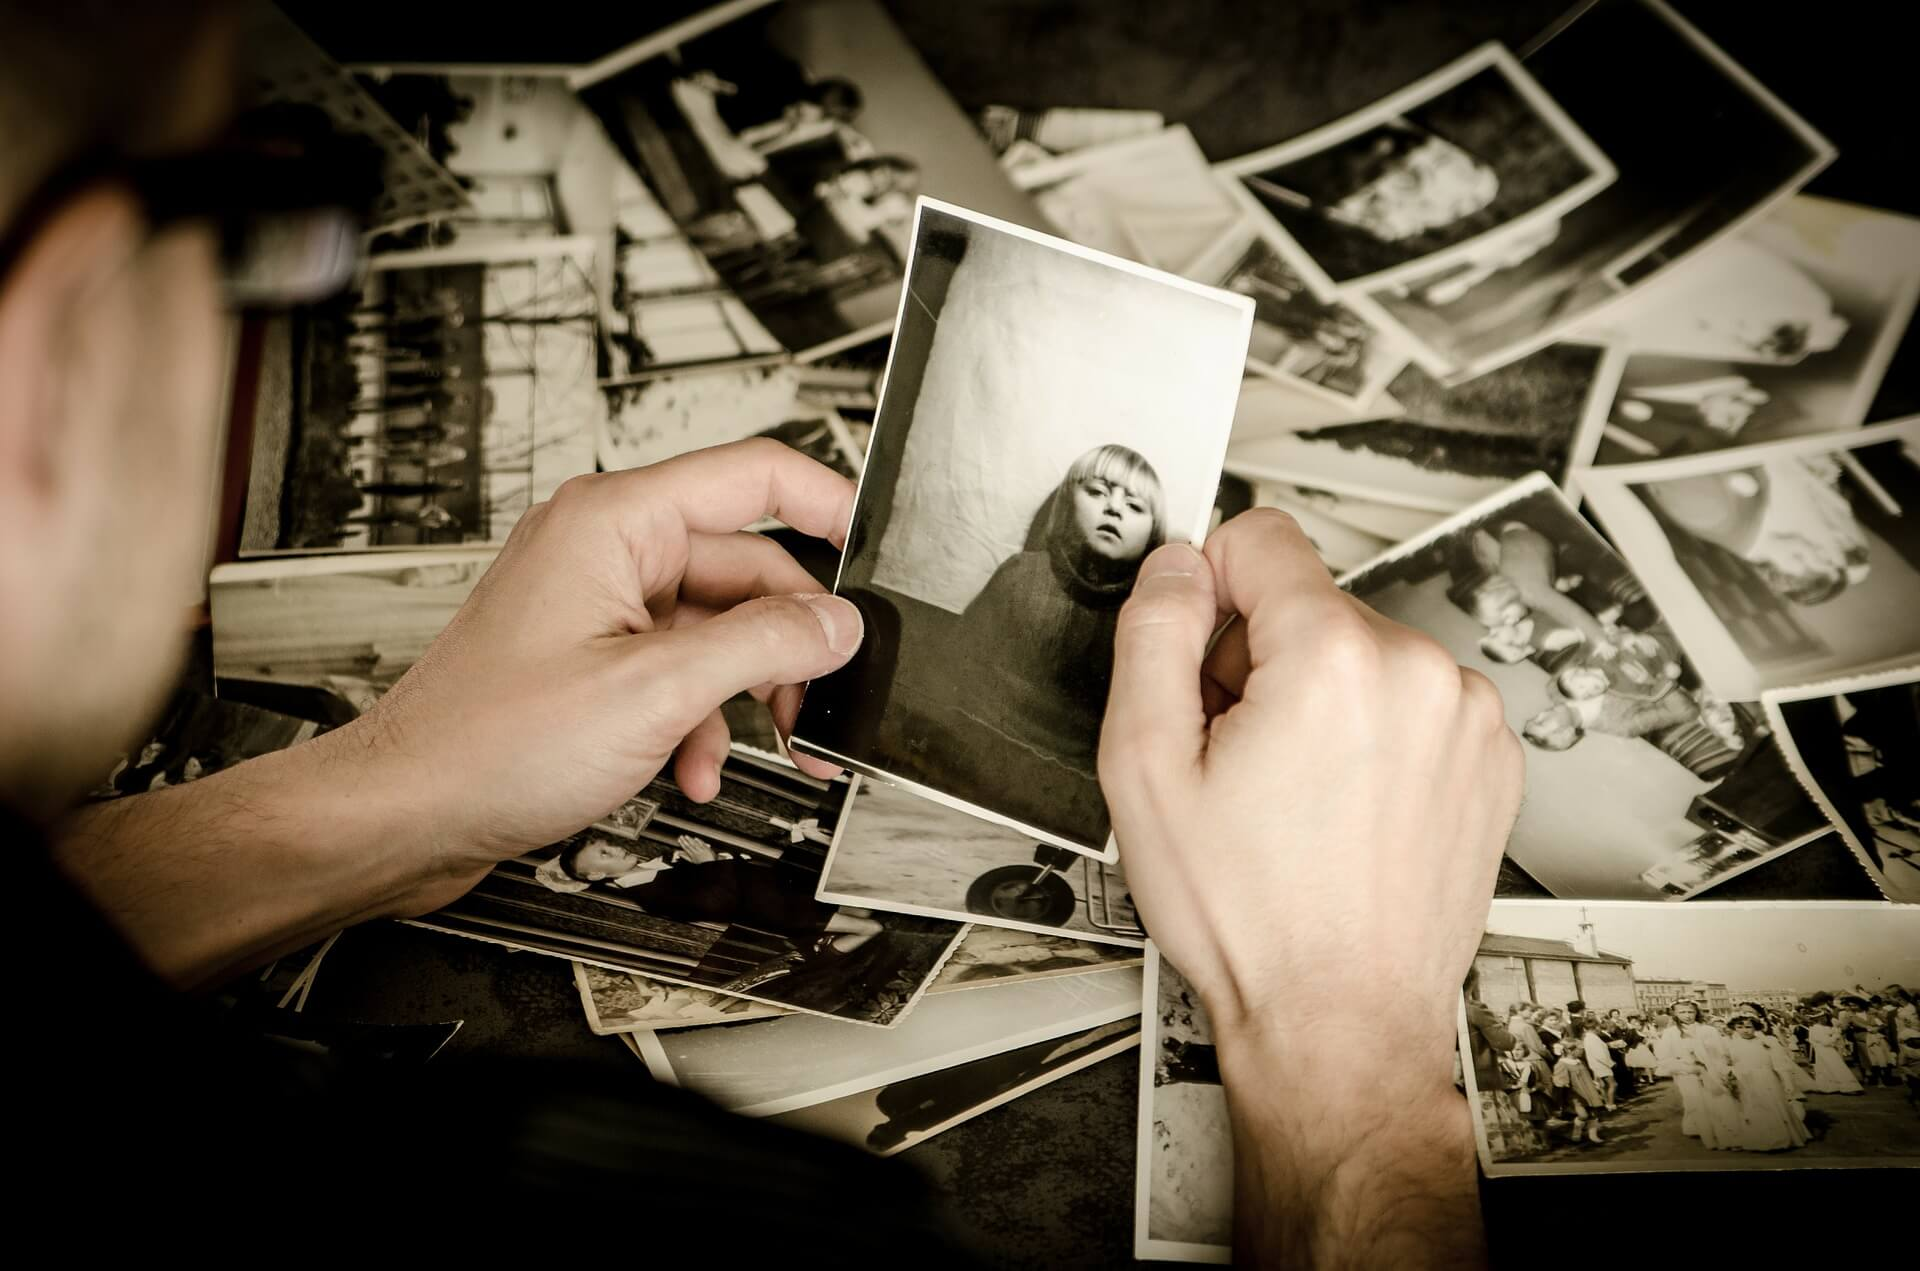 Self Storage - Remember the Deceased